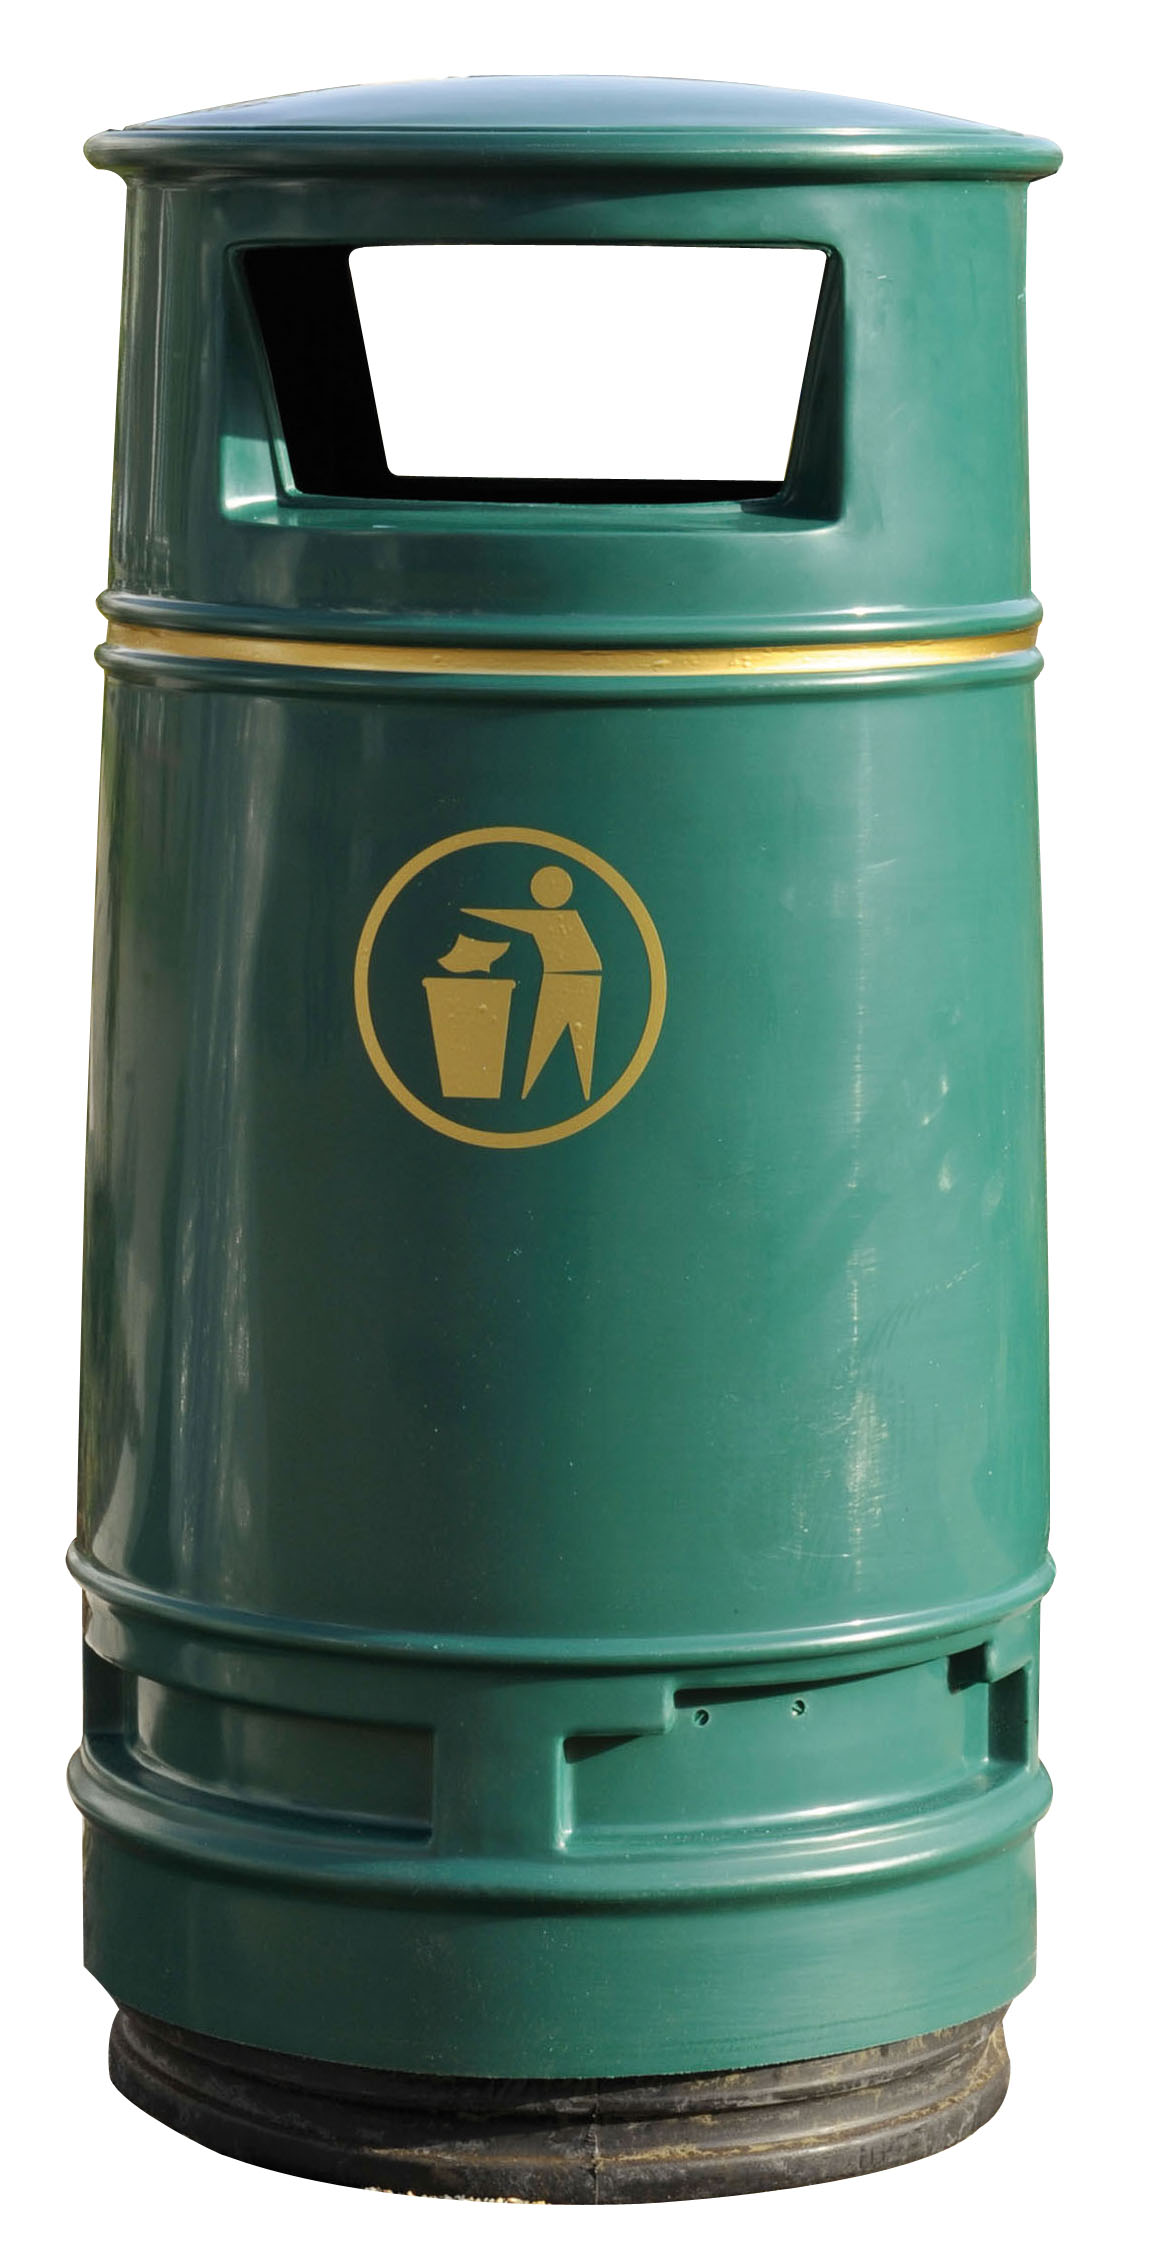 Abfallkorb Montreal 40 Oder 90 Liter